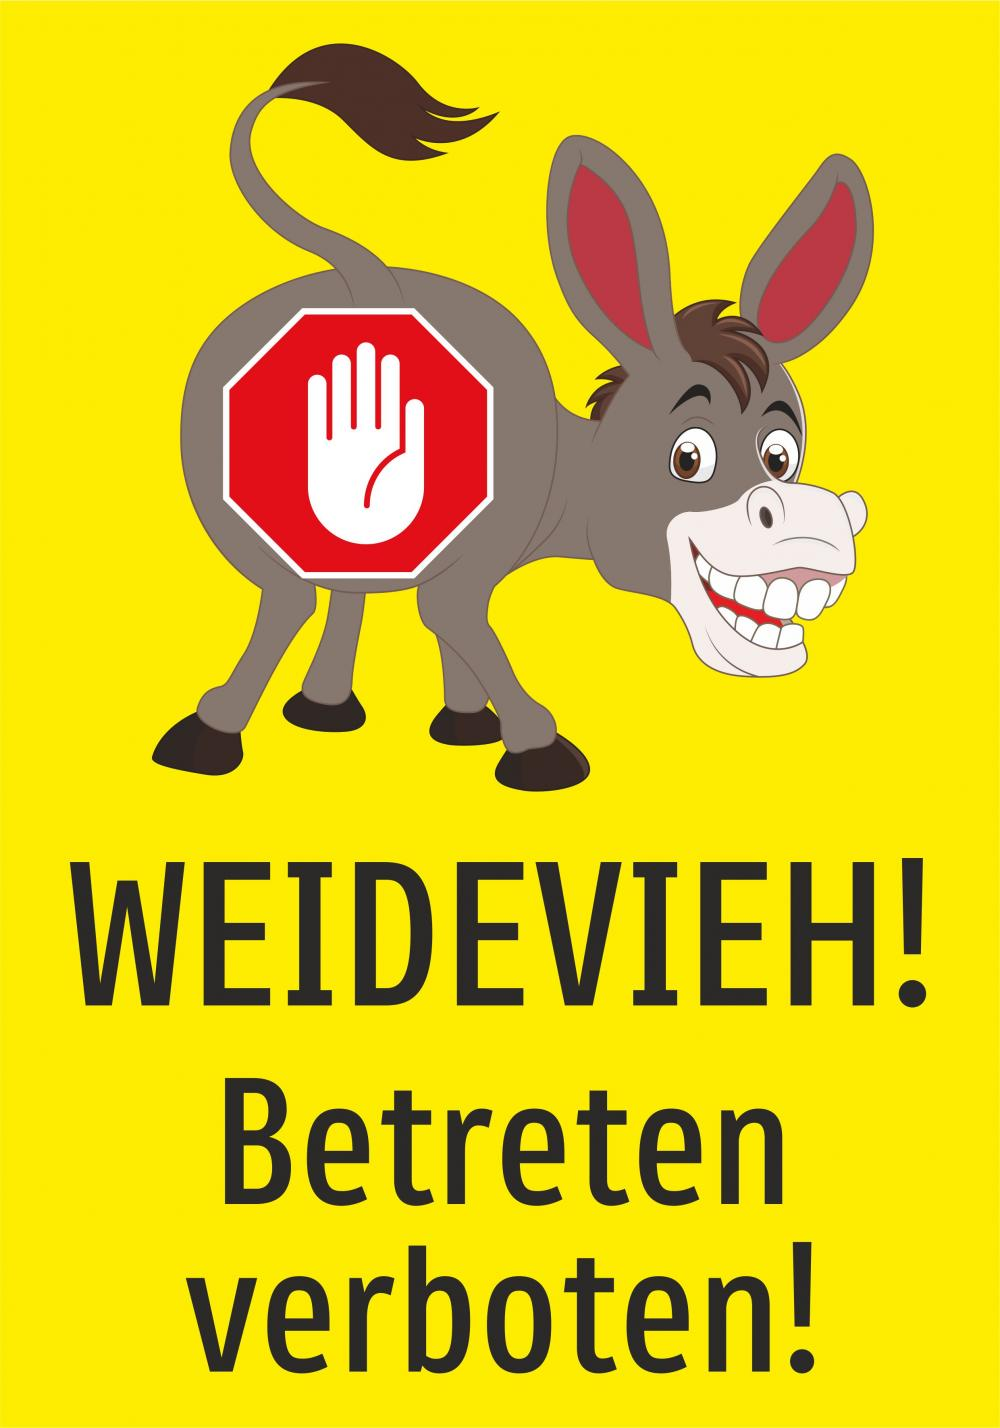 Achtung Weidevieh! Betreten verboten!